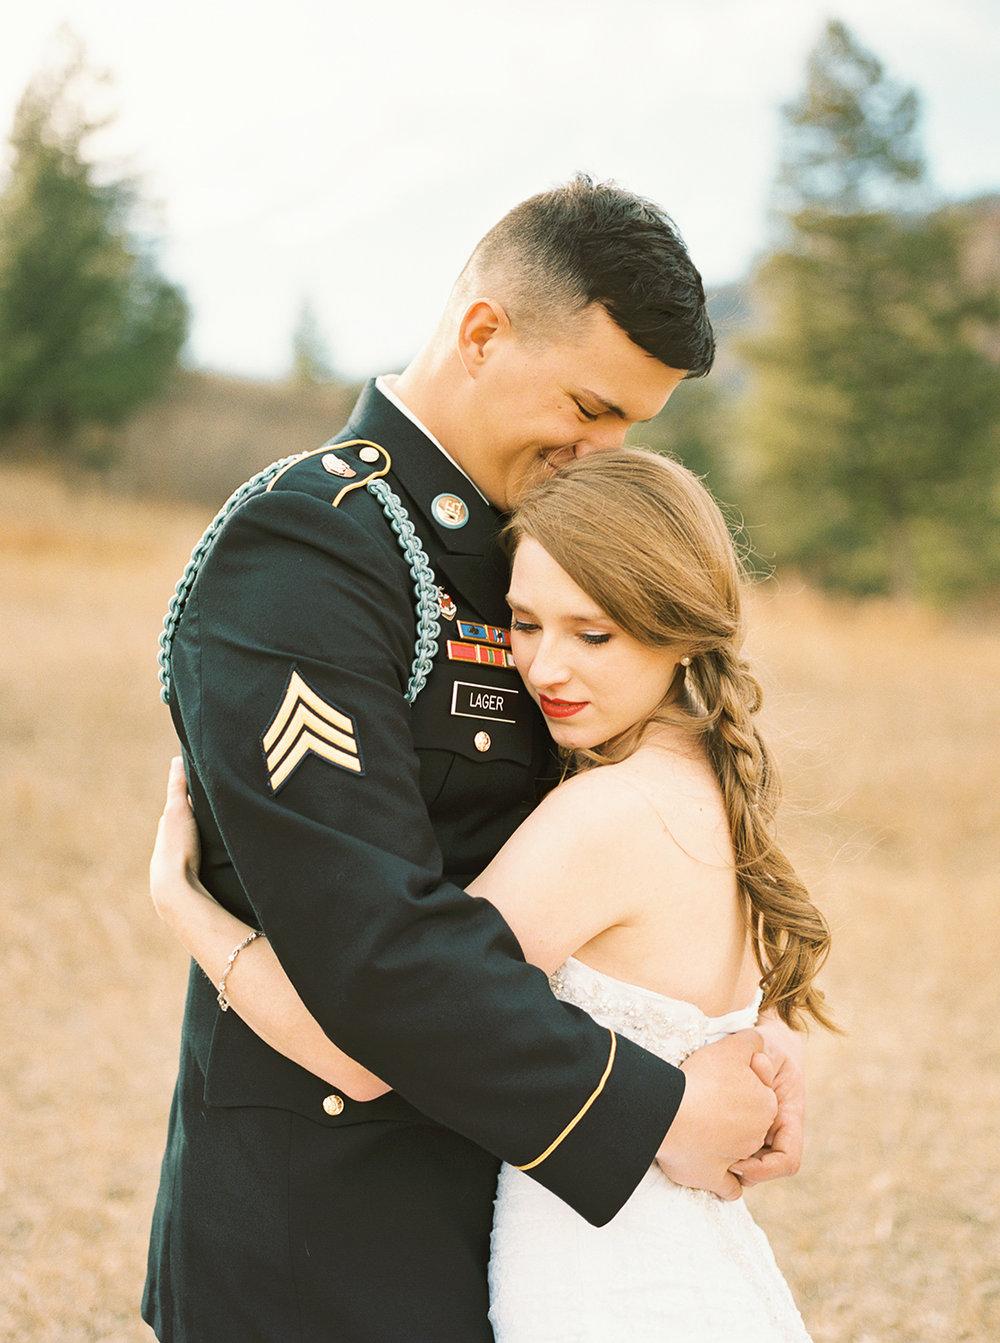 colorado-springs-military-wedding-skylar-rain-photography-j-d-10.jpg